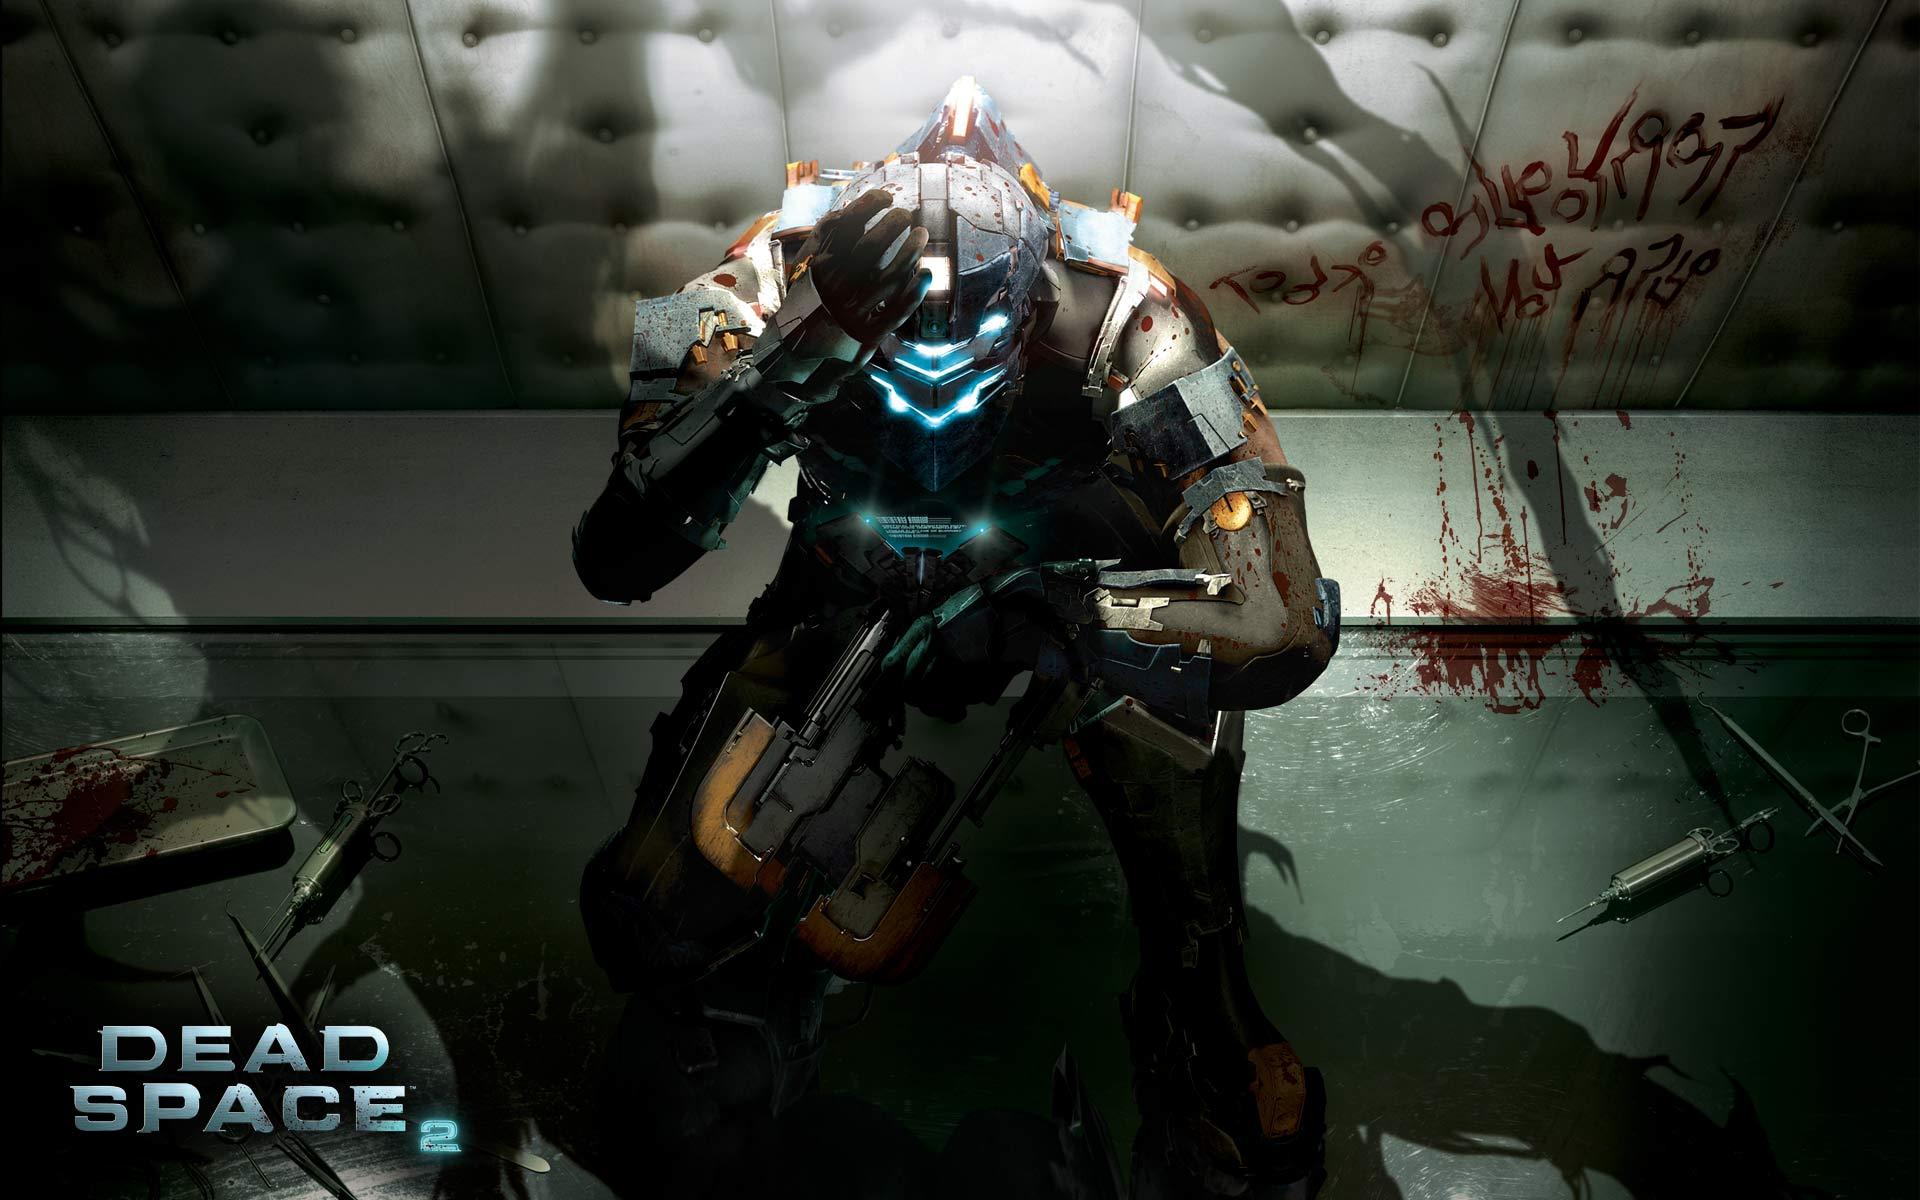 Dead Space 2 Fondo De Pantalla Hd Fondo De Escritorio